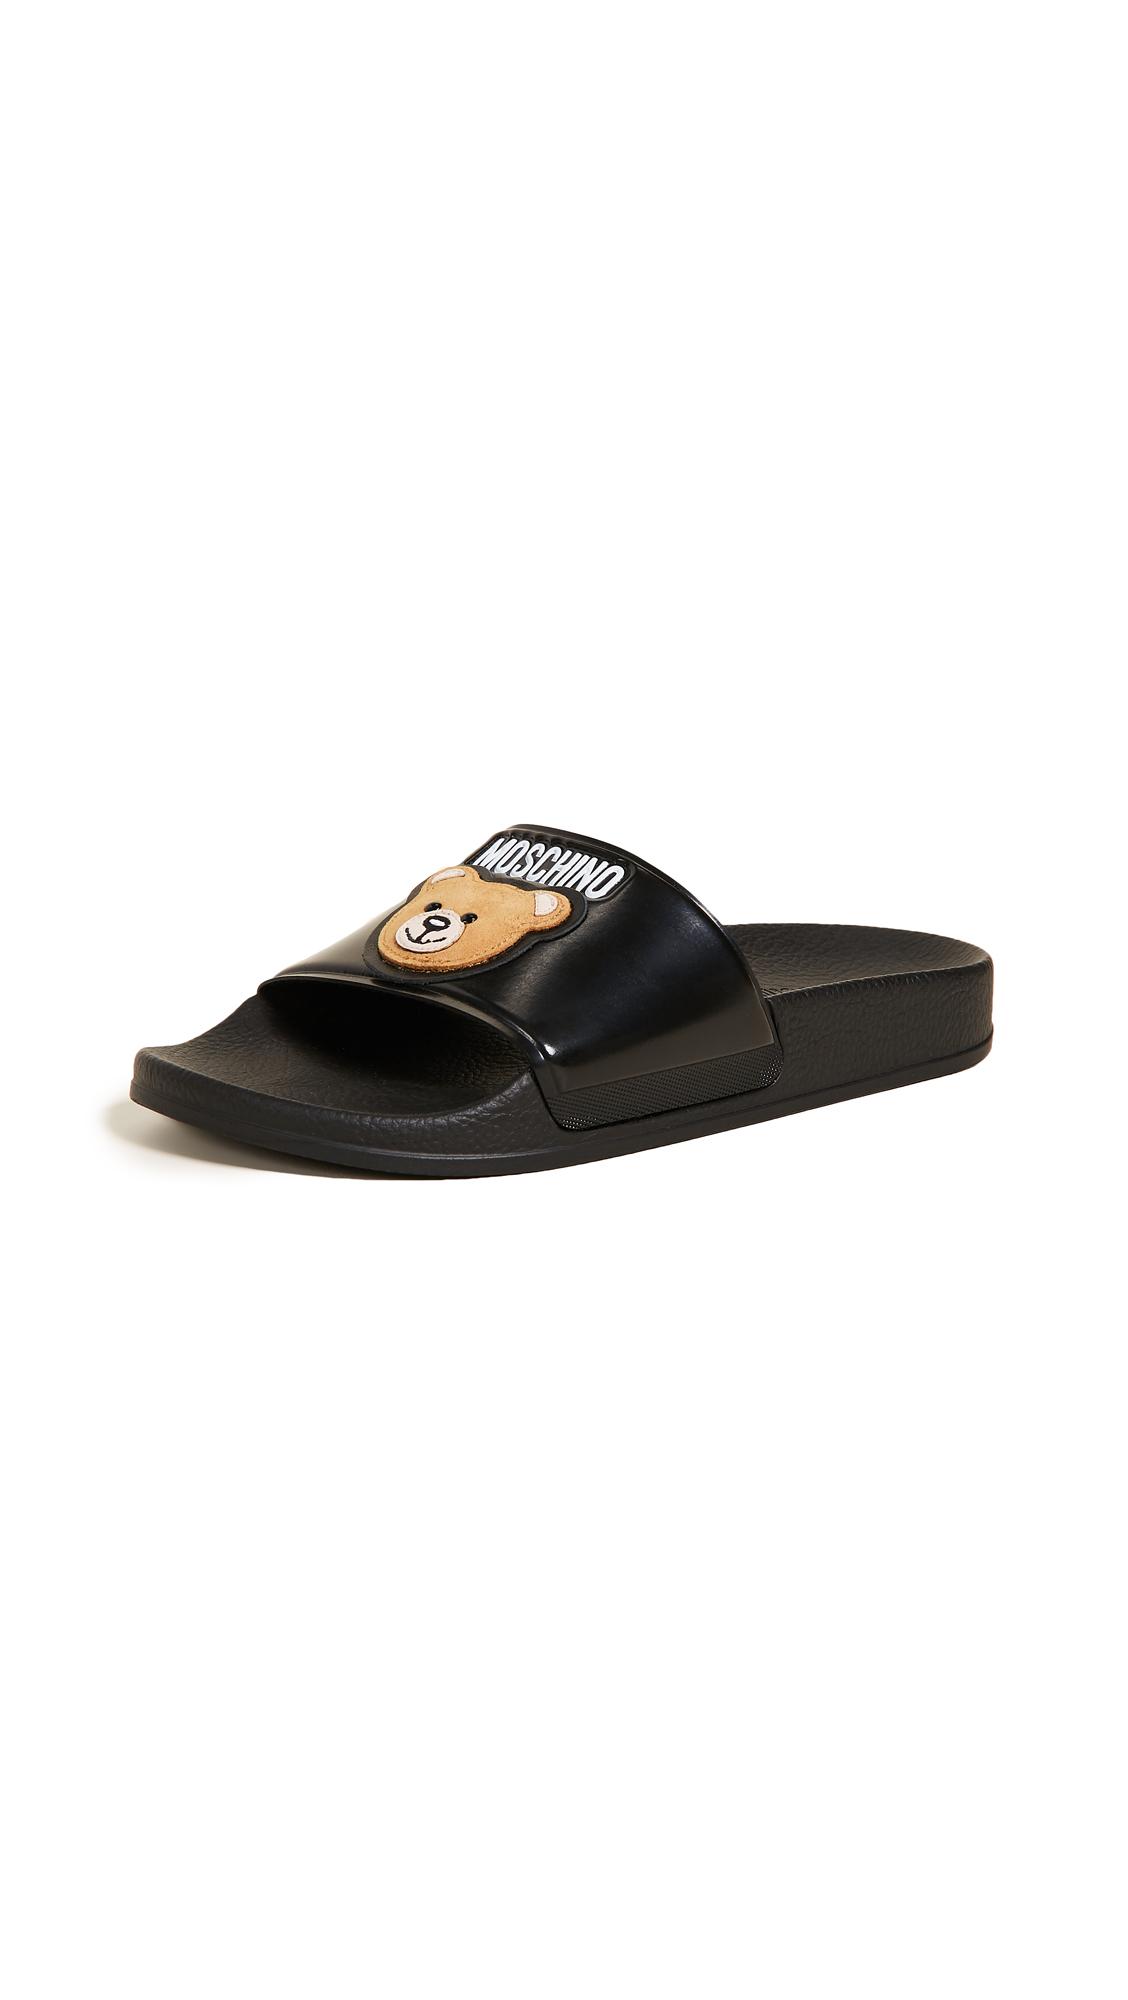 Moschino Slides - Black